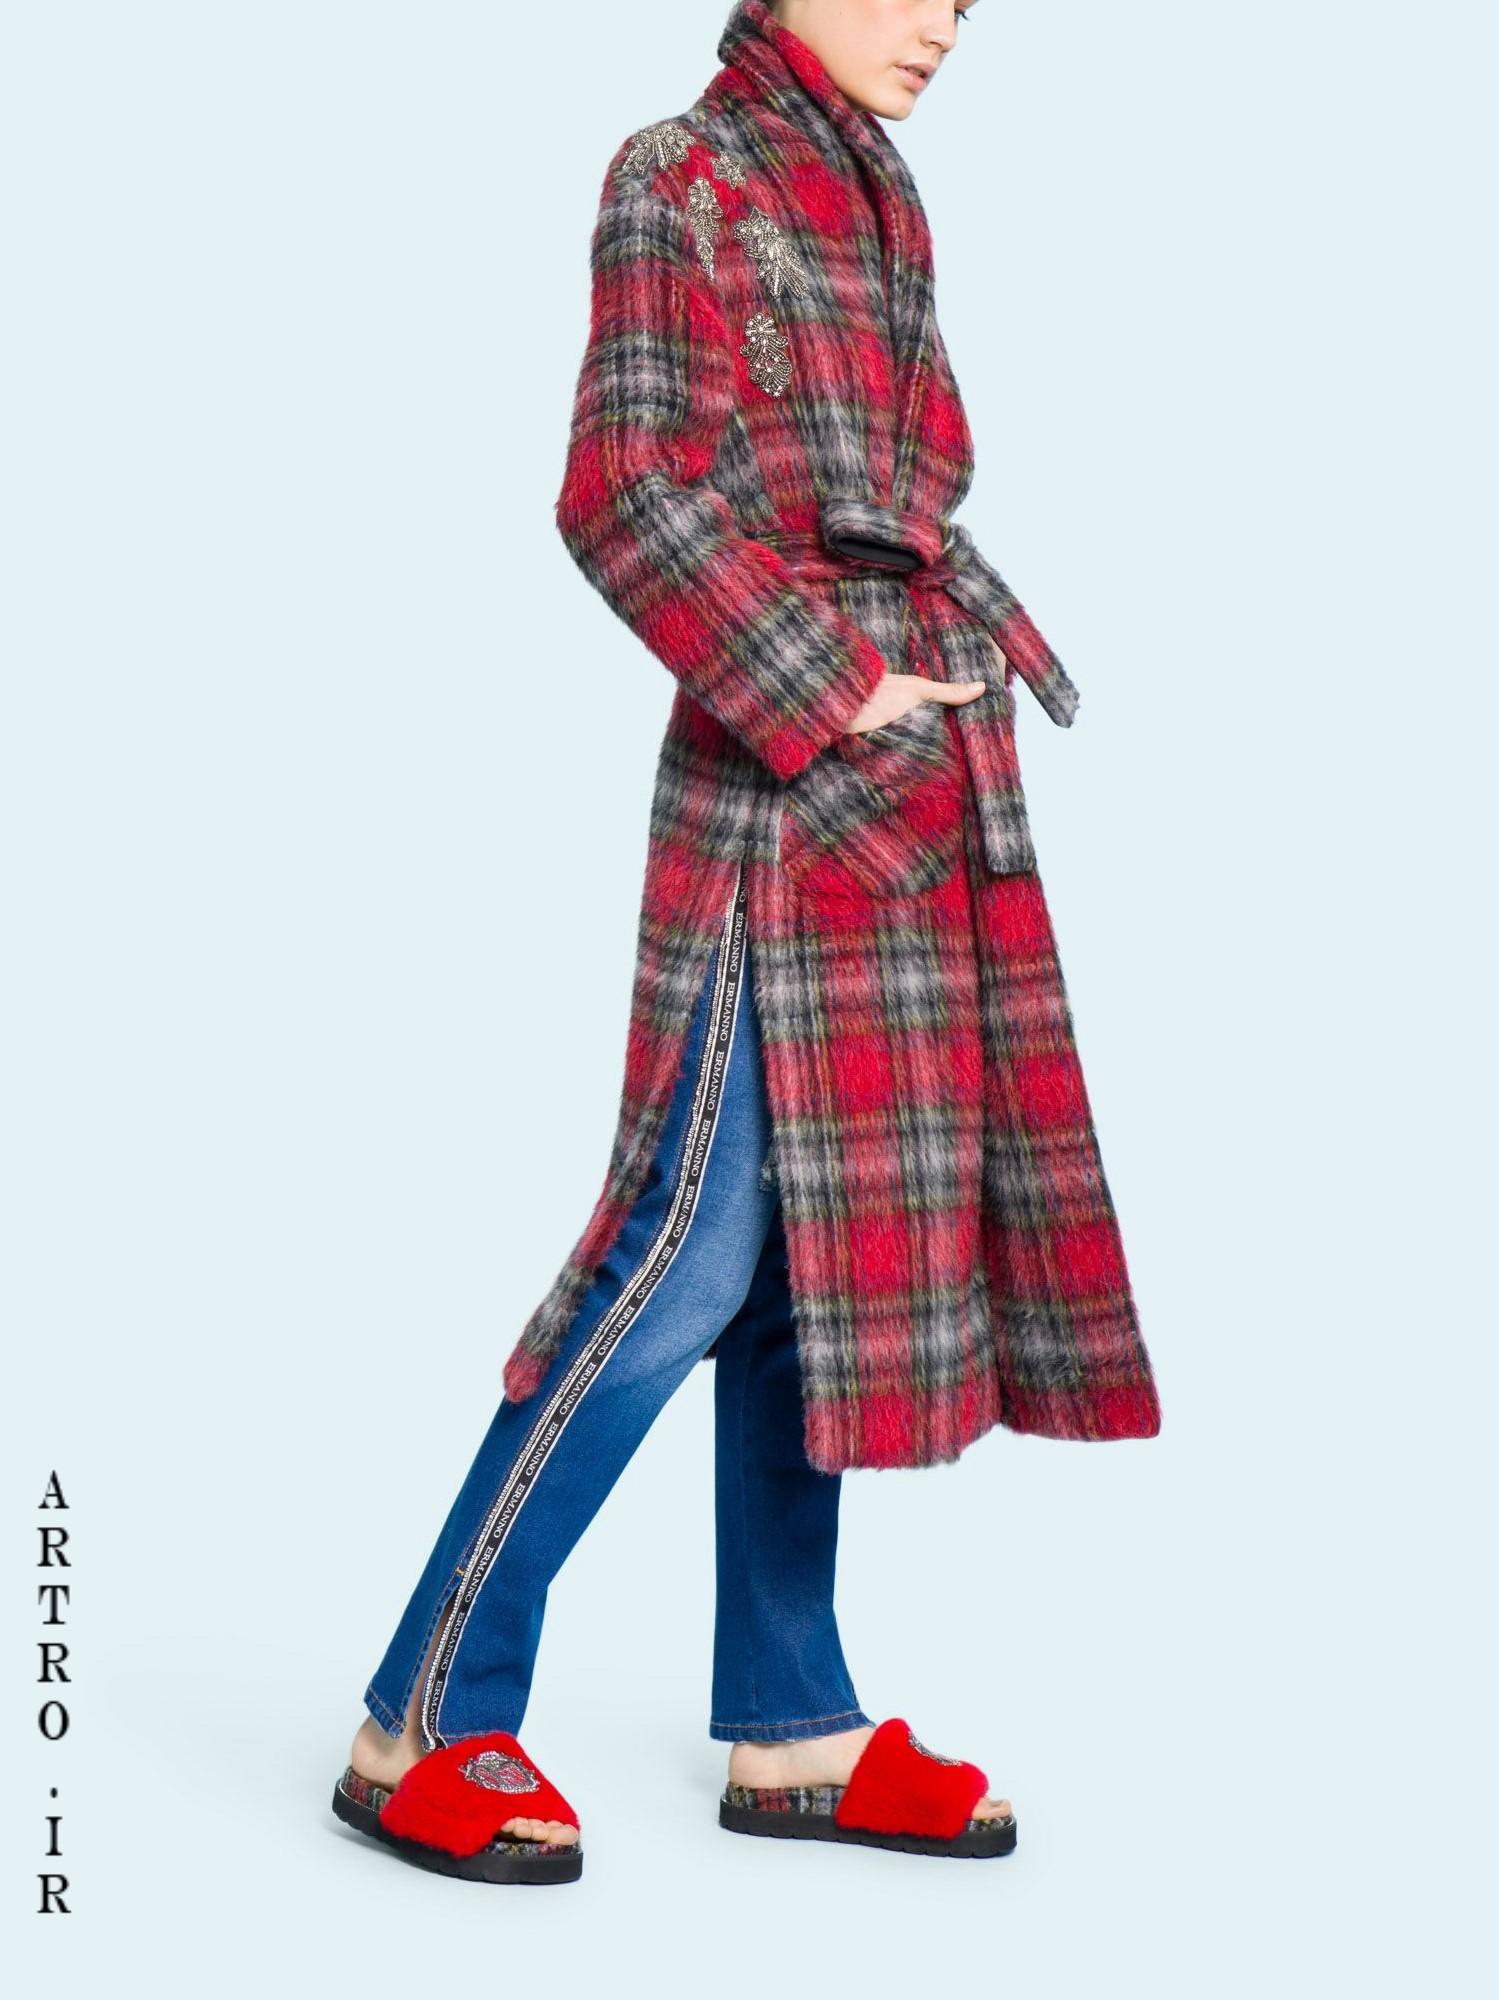 مدل پالتو جدید دخترانه پشم